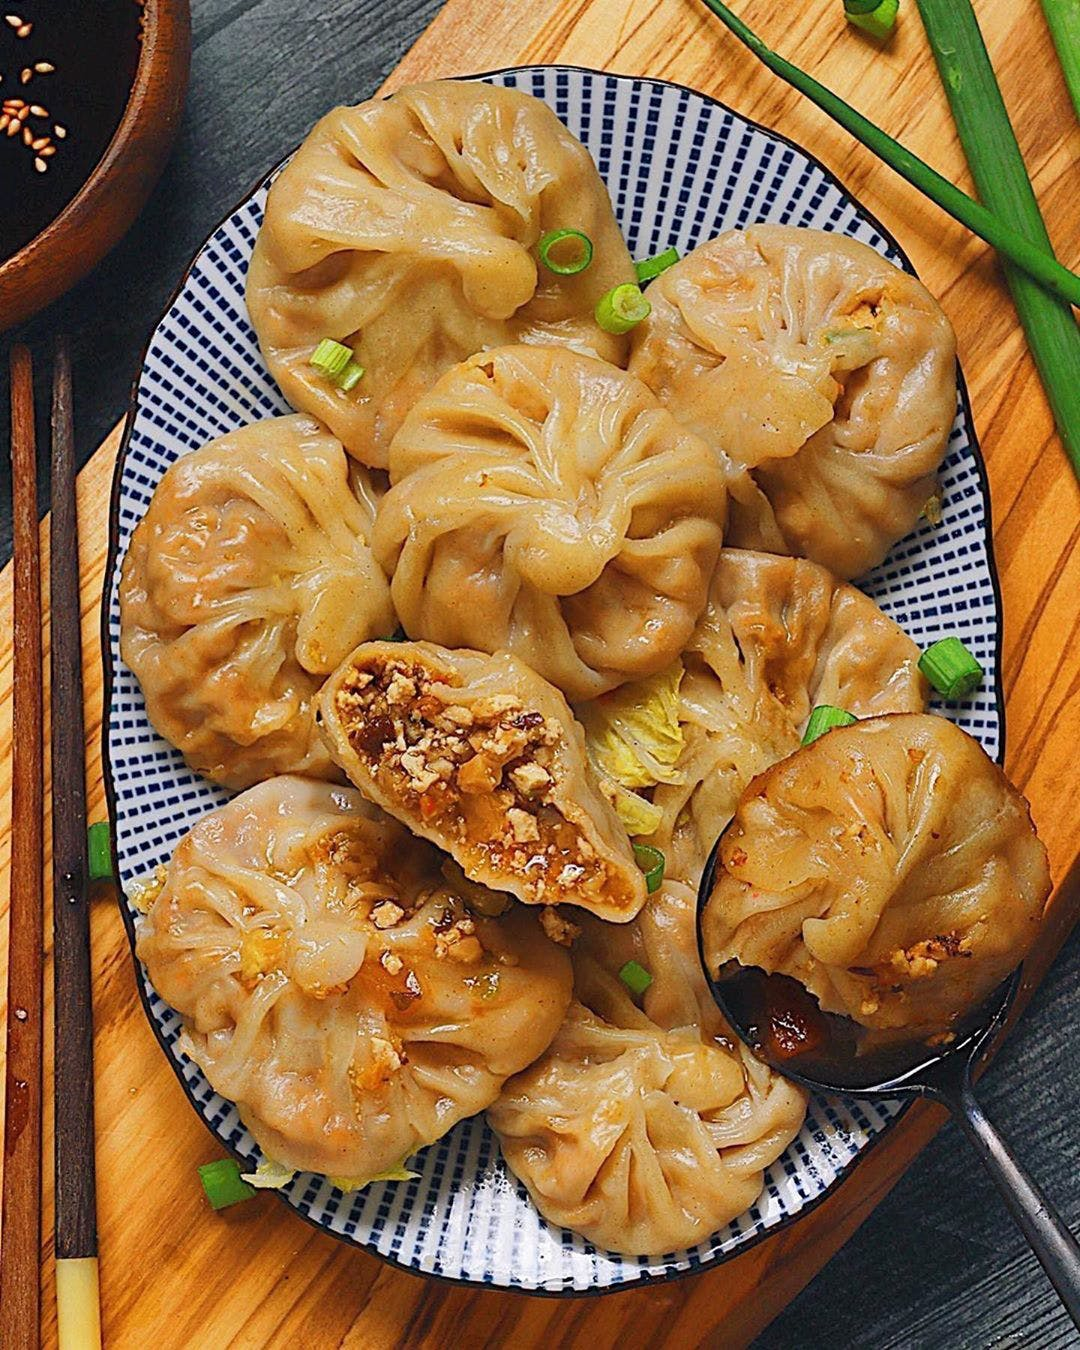 xiaolongbao on plate